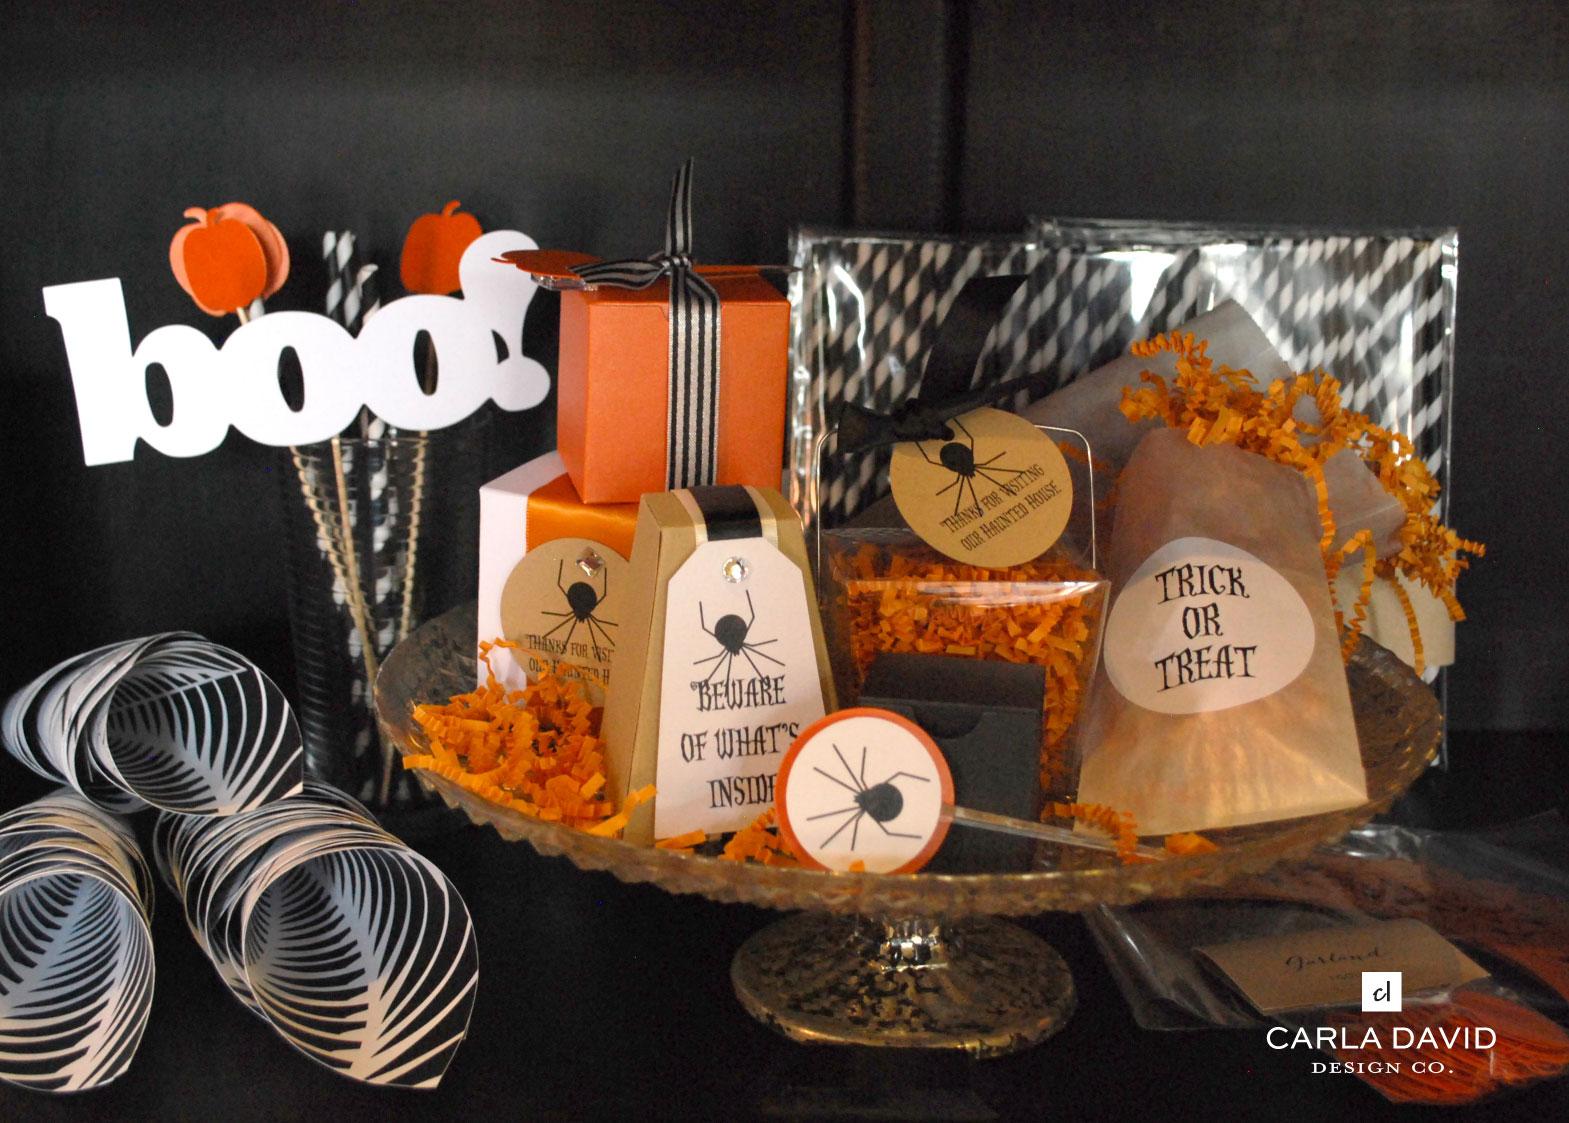 sbootacular halloween party goods | carla david blog